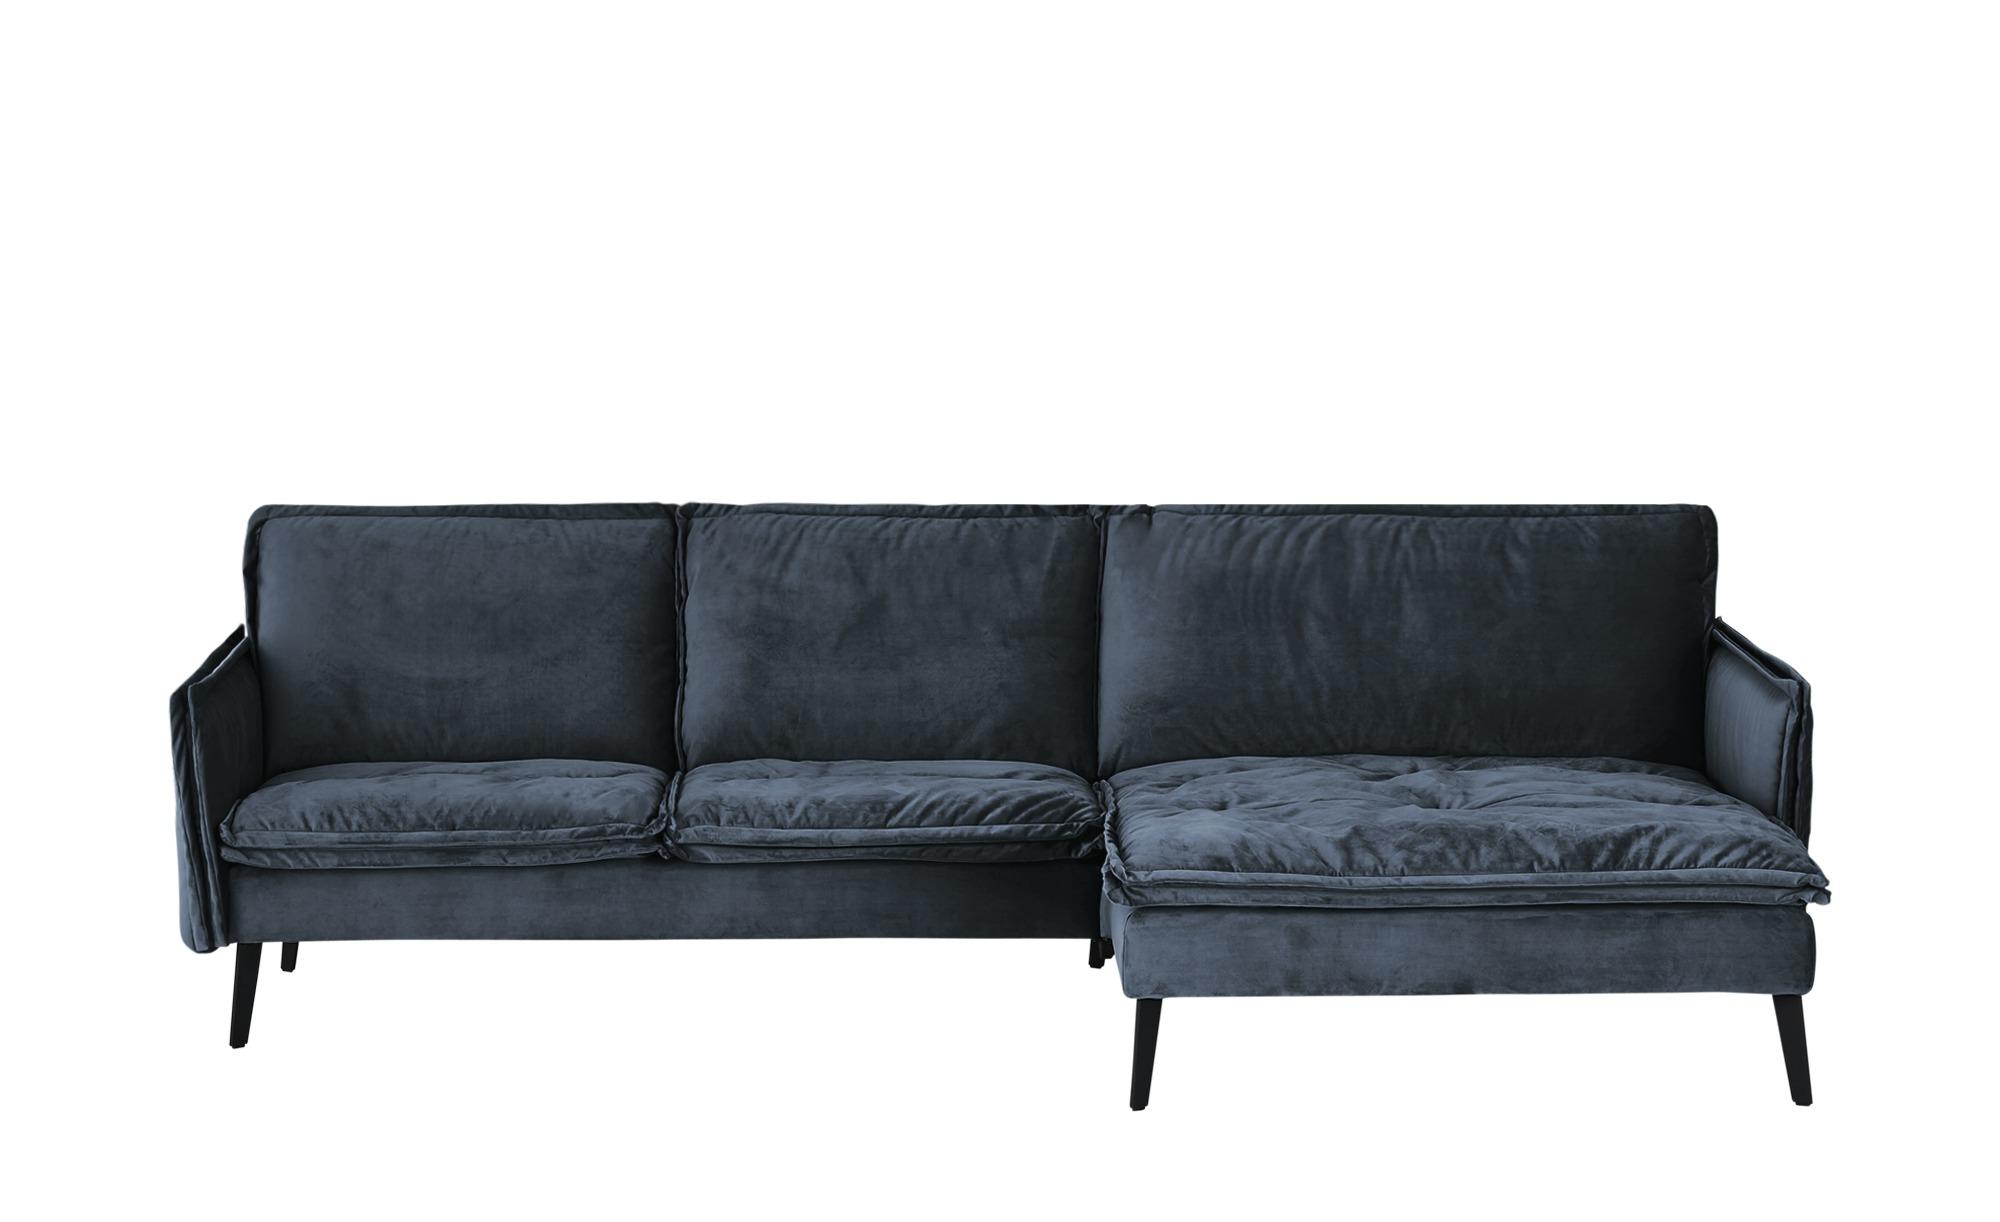 Musterring Ecksofa  Rahel ¦ blau ¦ Maße (cm): H: 94 Polstermöbel > Sofas > Ecksofas - Höffner